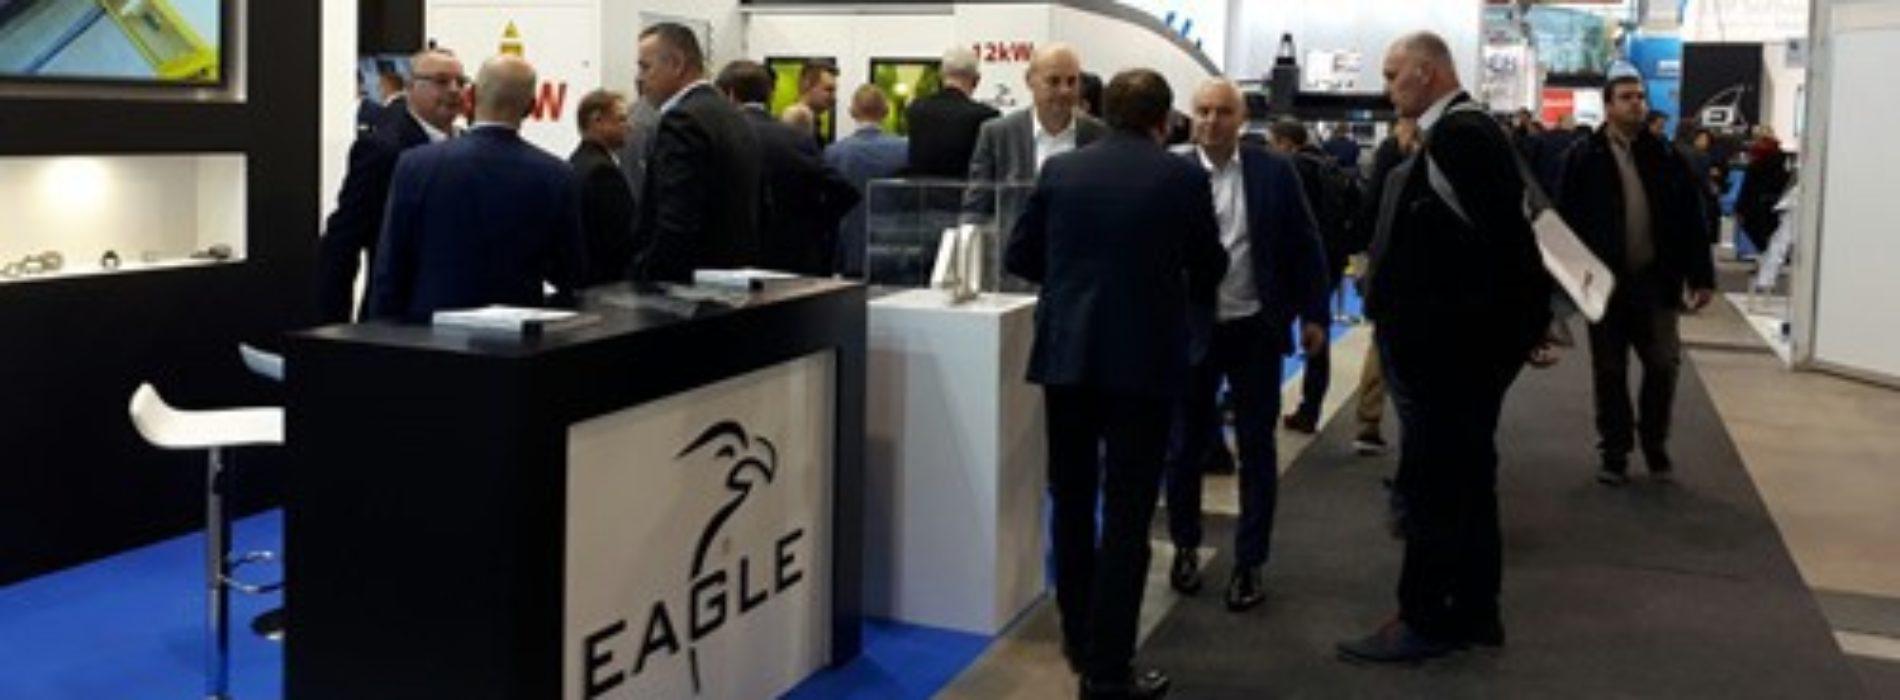 EAGLE podsumowuje rok 2017